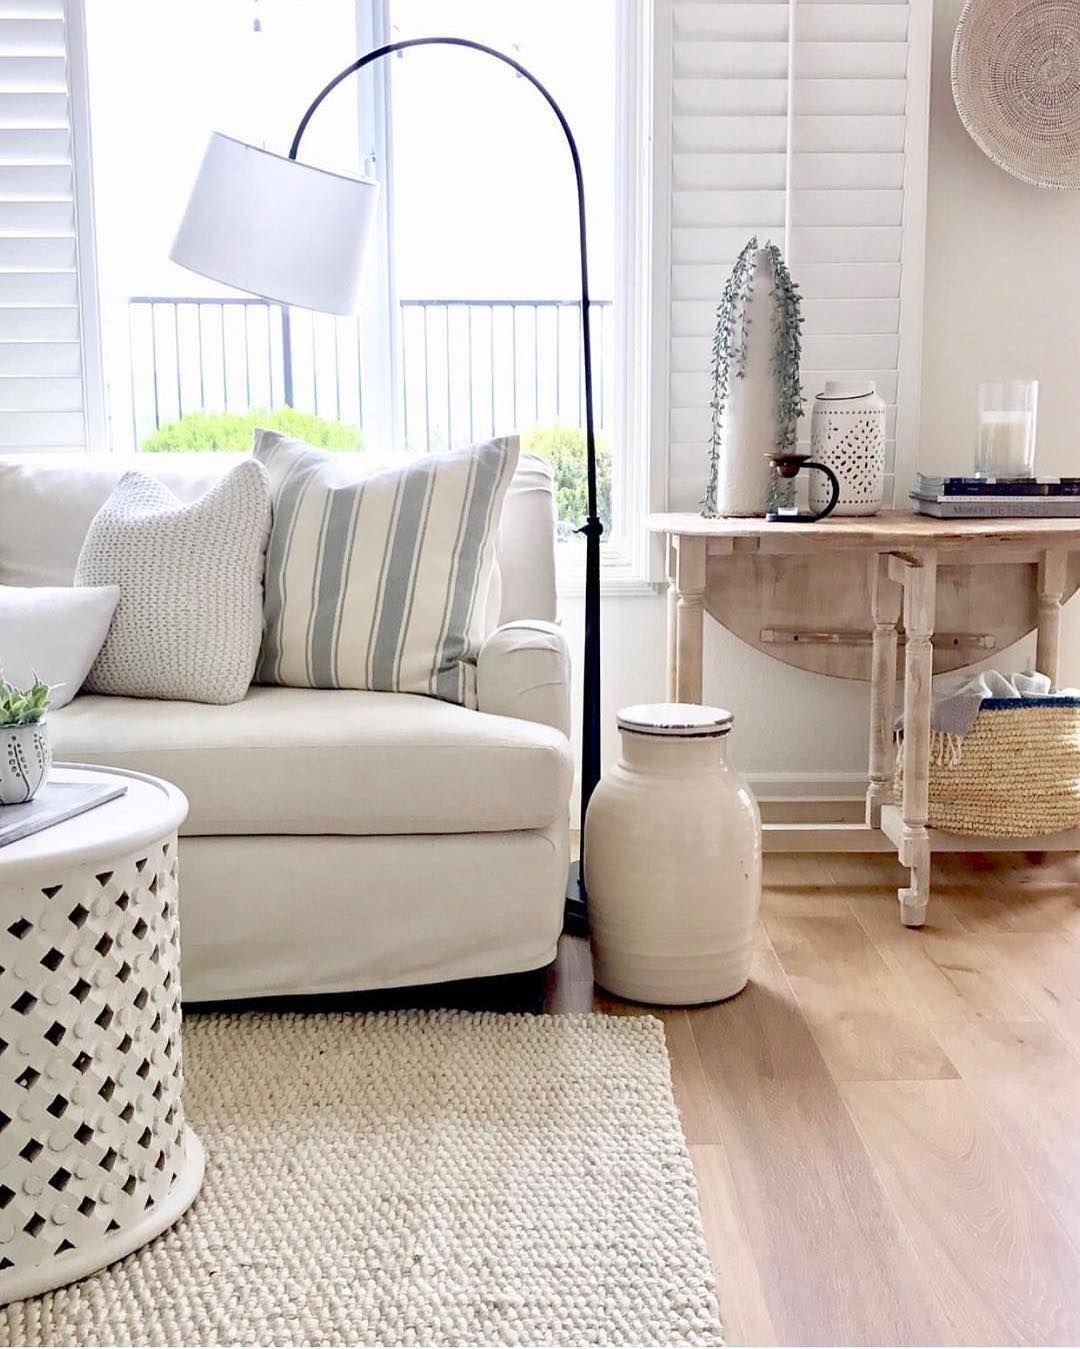 image air bel fairfield ca in of full circle property floors estate real flooring